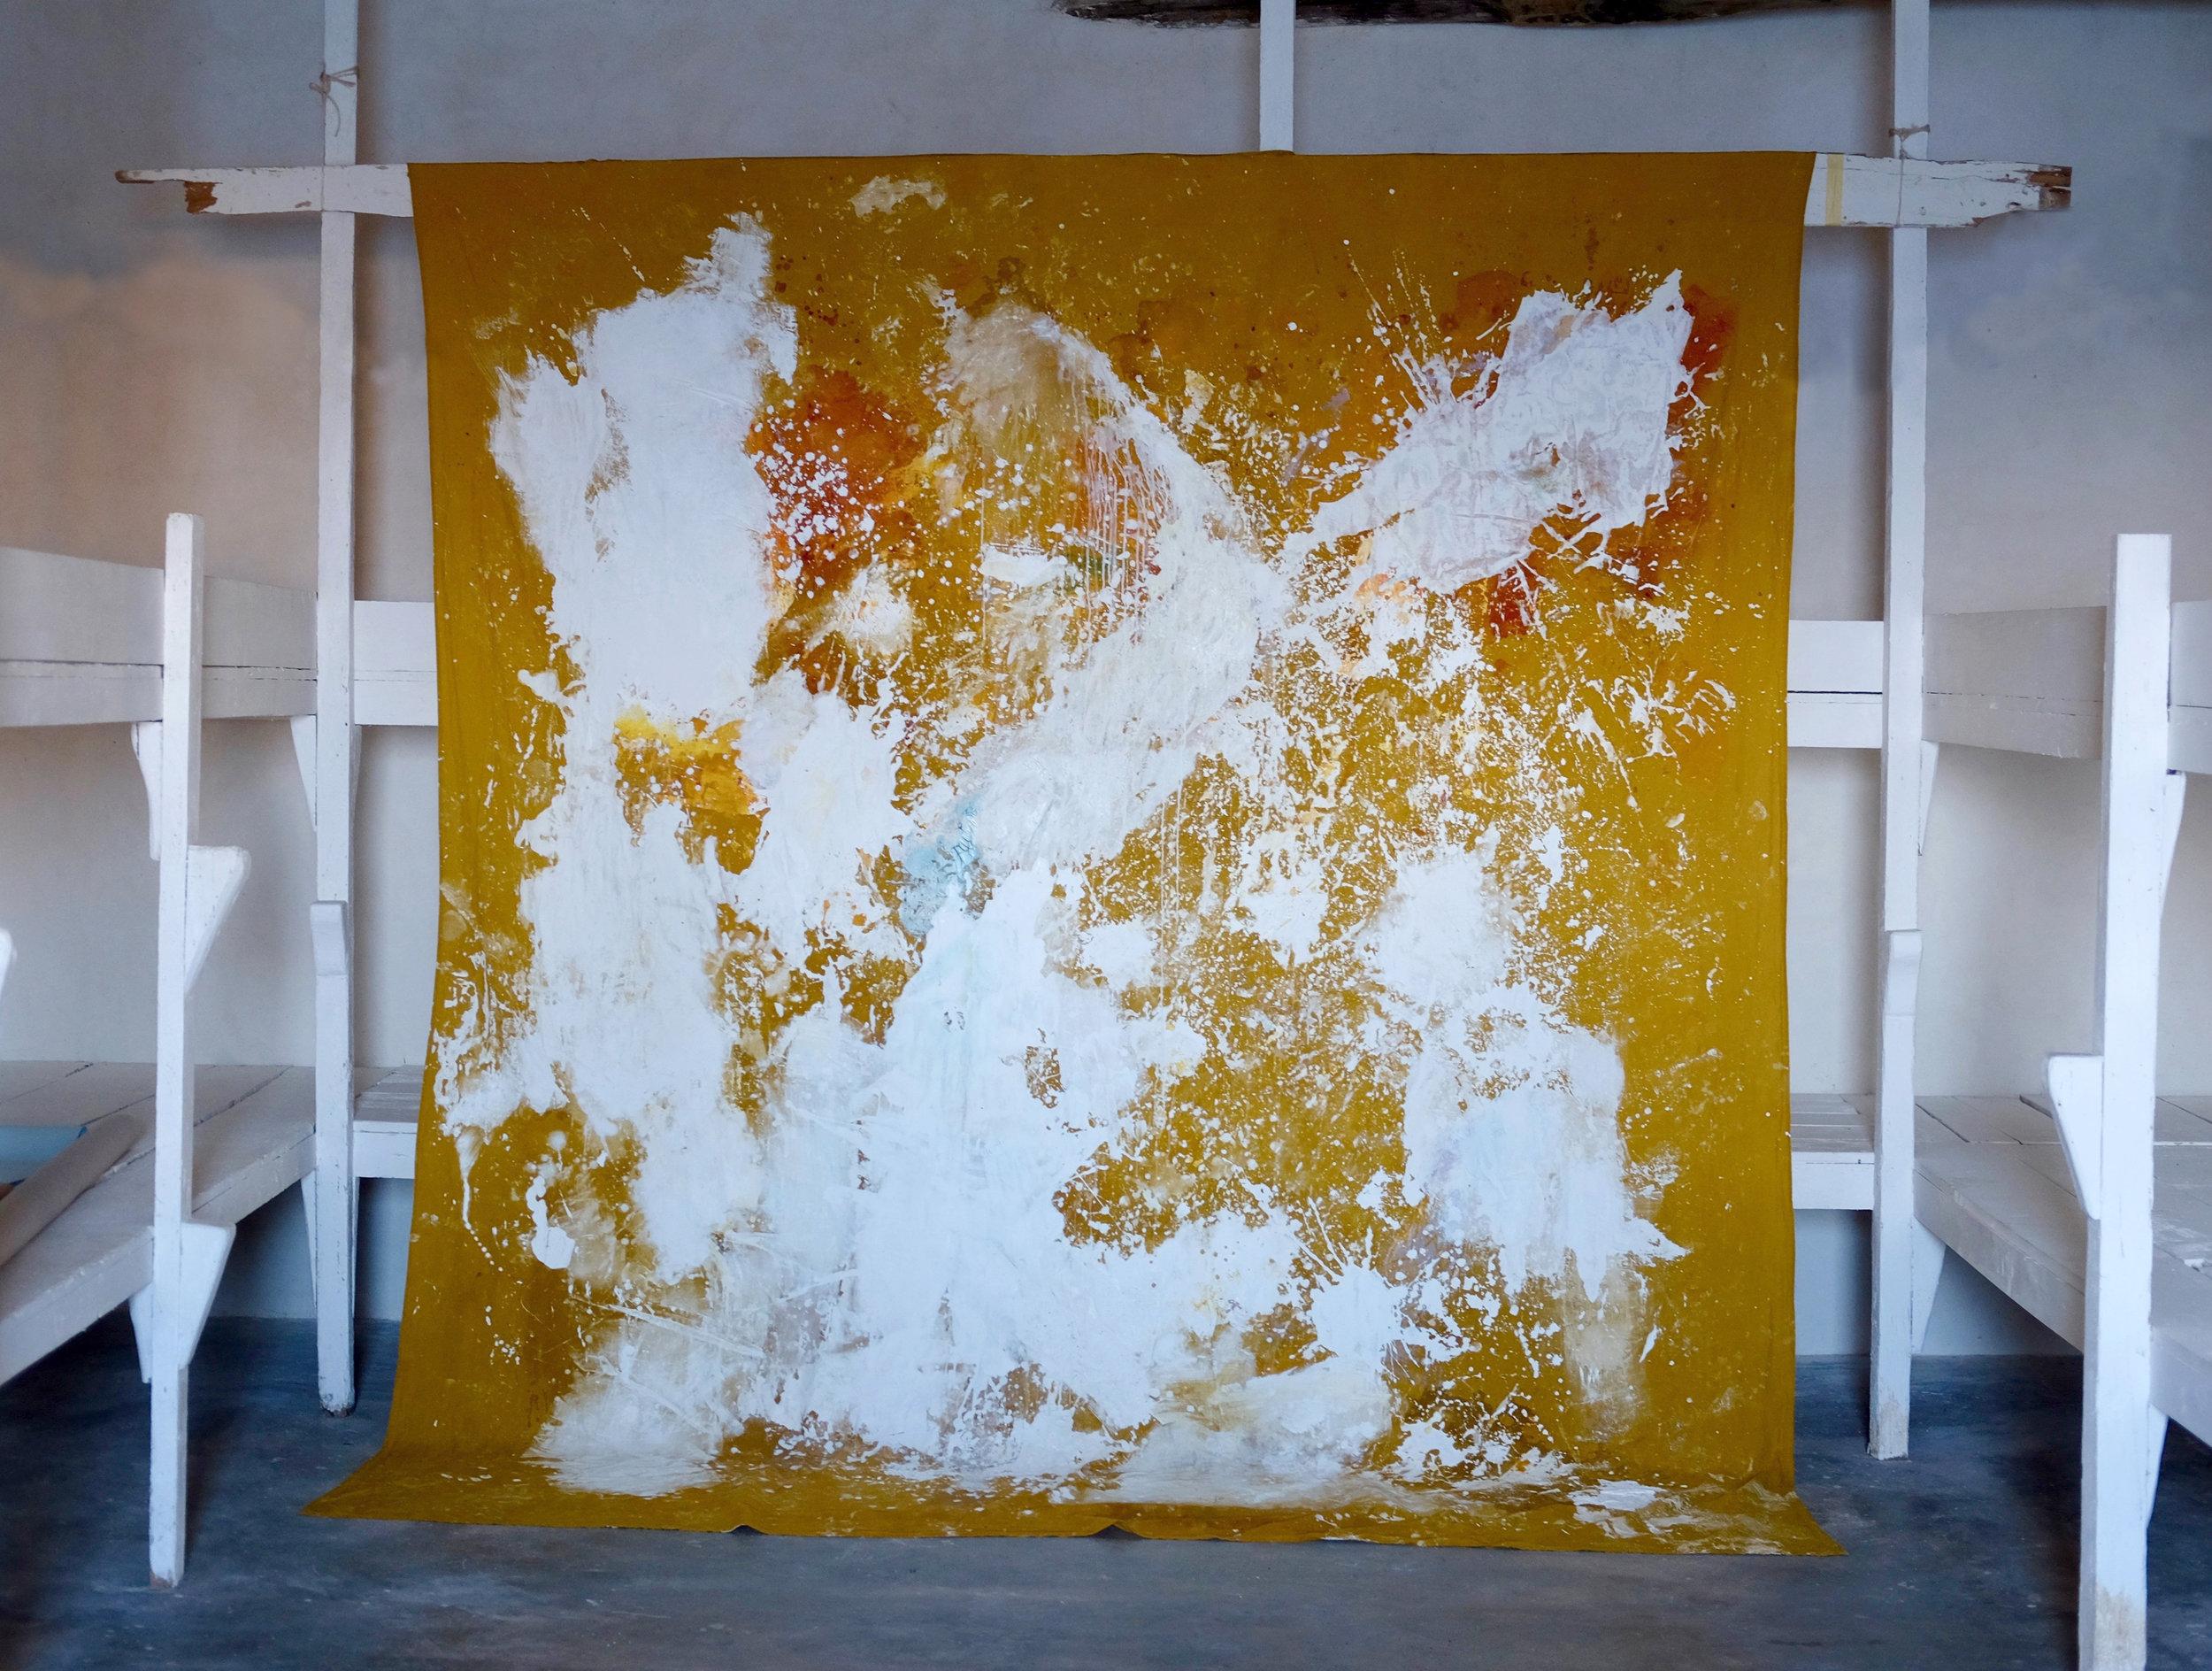 Février 2019, 310x270 cm, mixed medias on free linen canvas